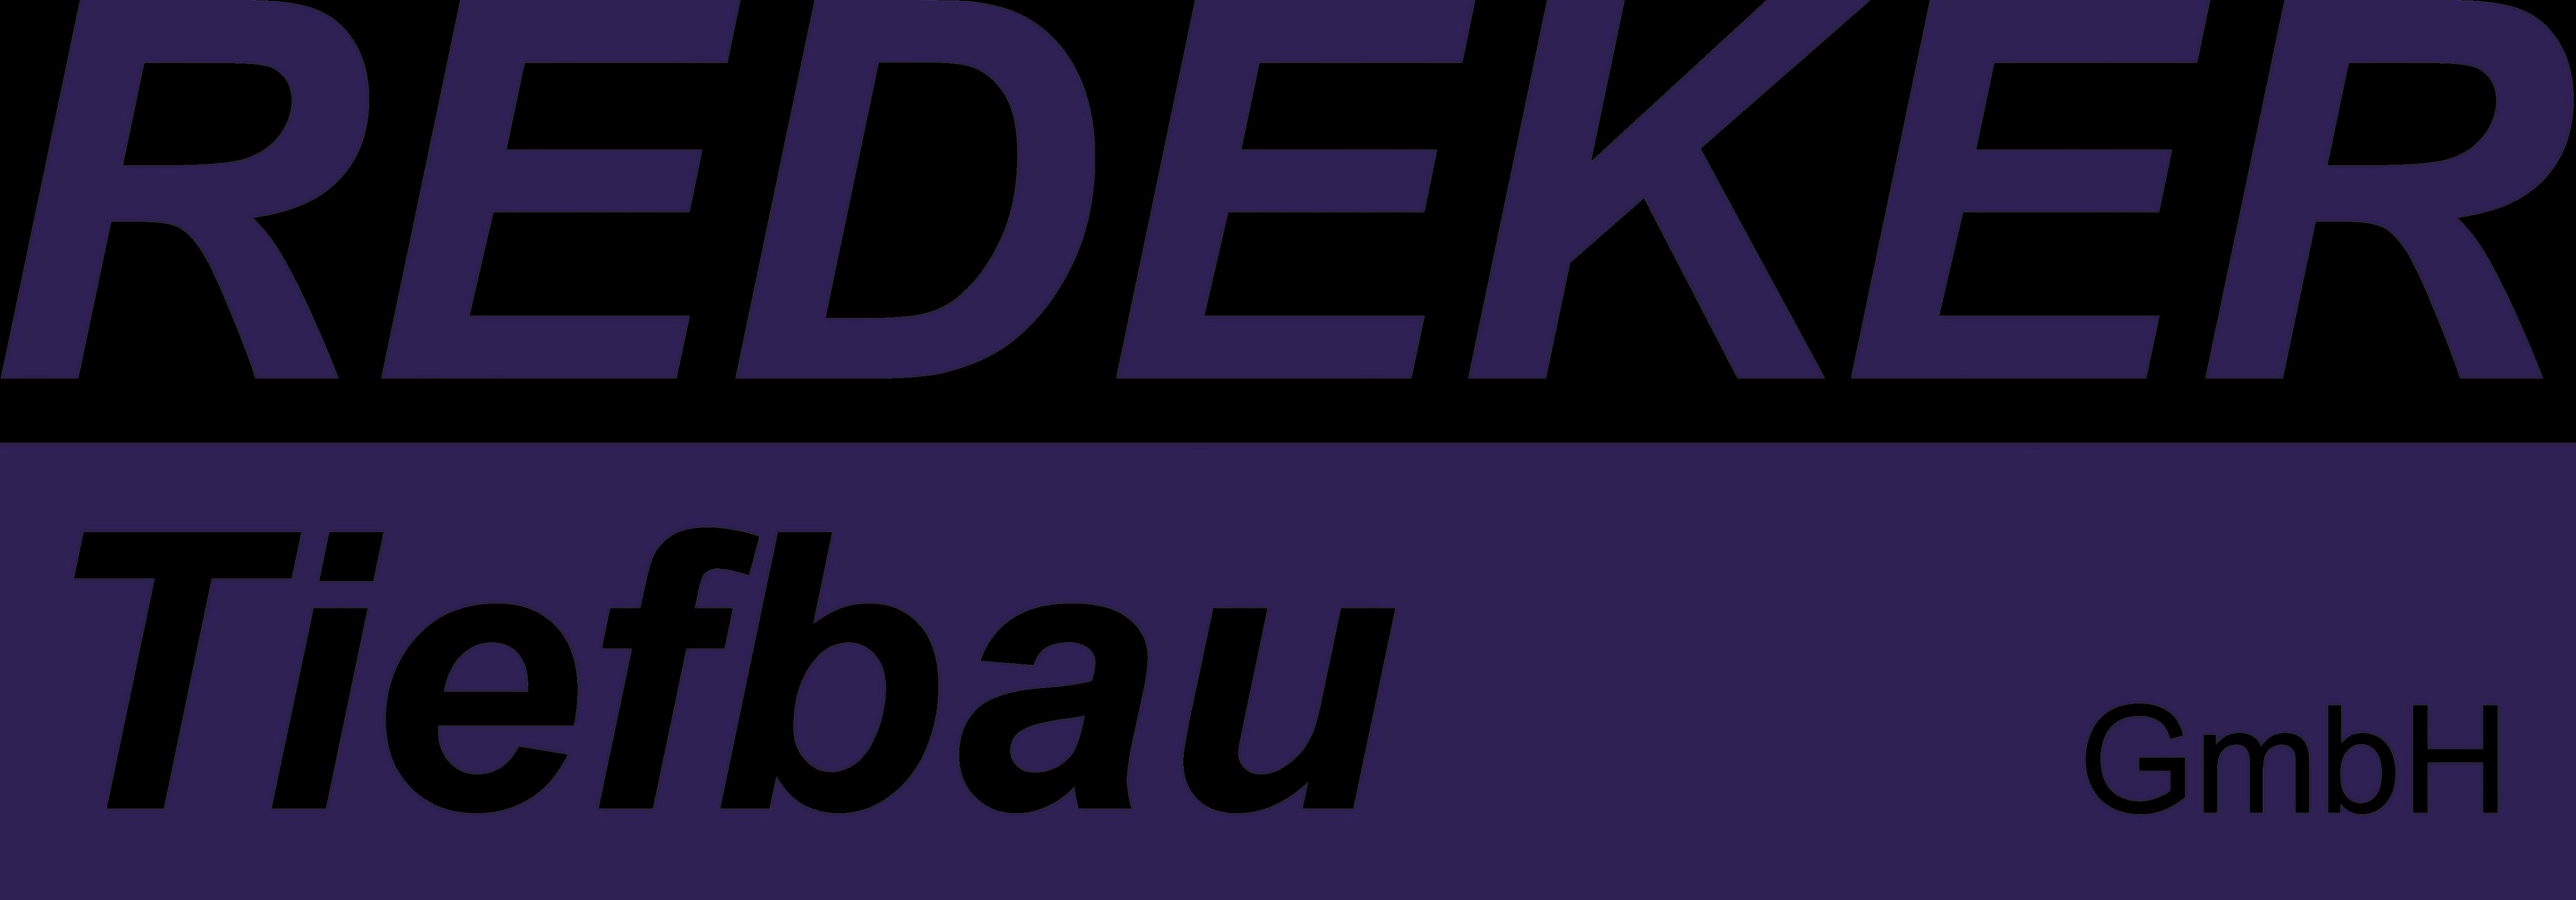 https://redeker-tiefbau.de/wp-content/uploads/2020/10/Logo_layer_copy.png